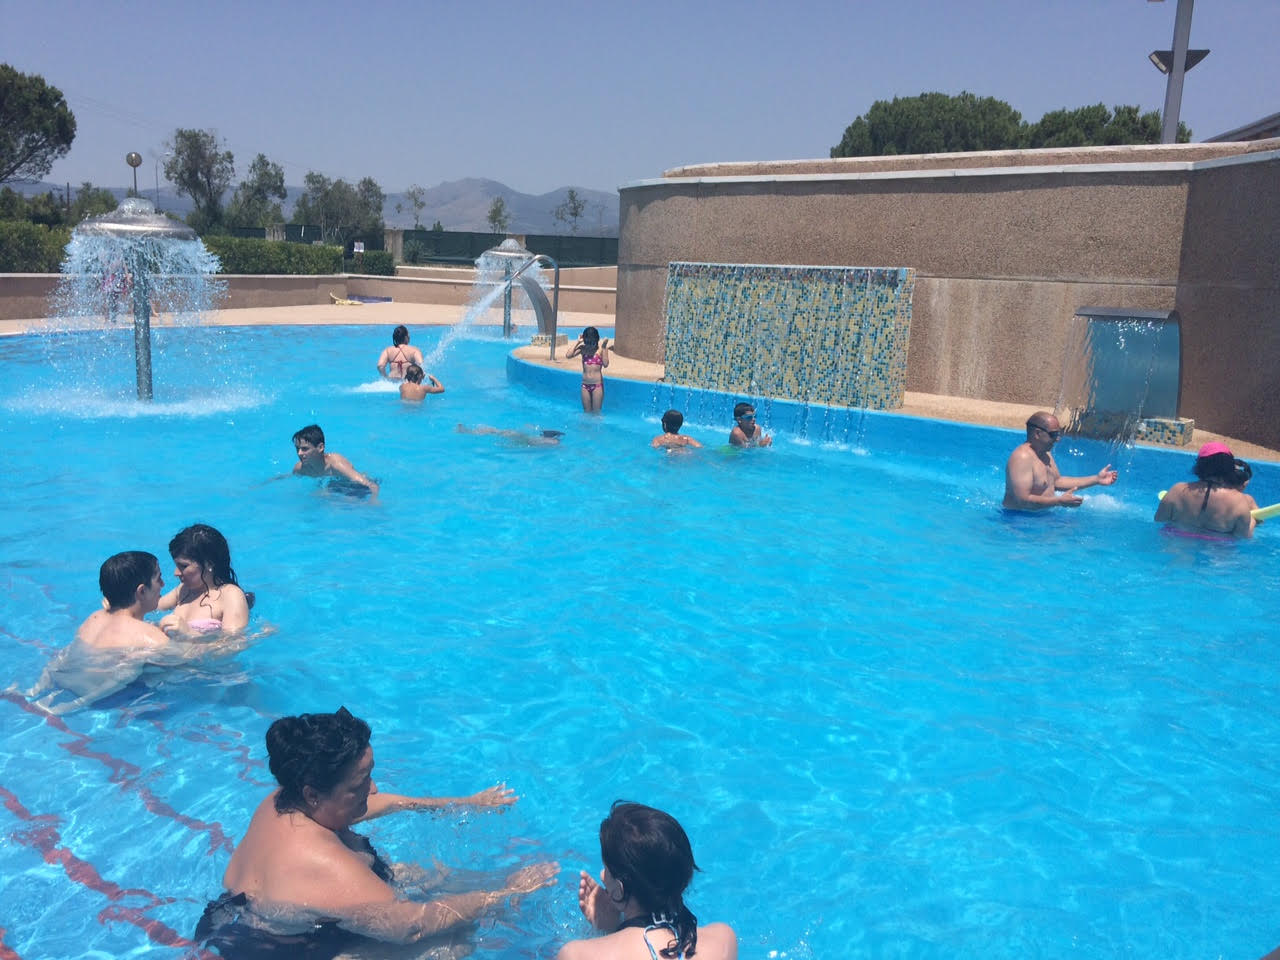 Cuanto vale una piscina perfect cunto cuesta una piscina for Cuanto cuesta hacer una piscina en colombia